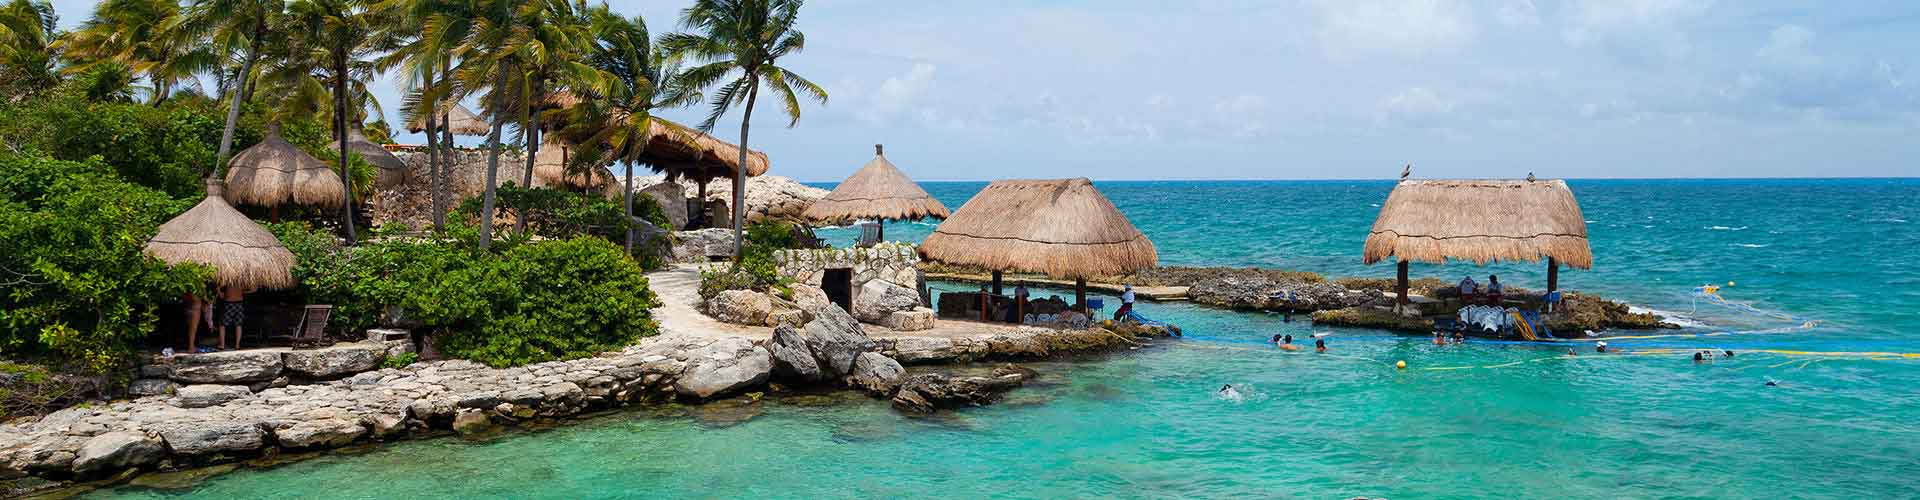 Cancún - Campamentos en Cancún. Mapas de Cancún, Fotos y comentarios de cada Campamento en Cancún.